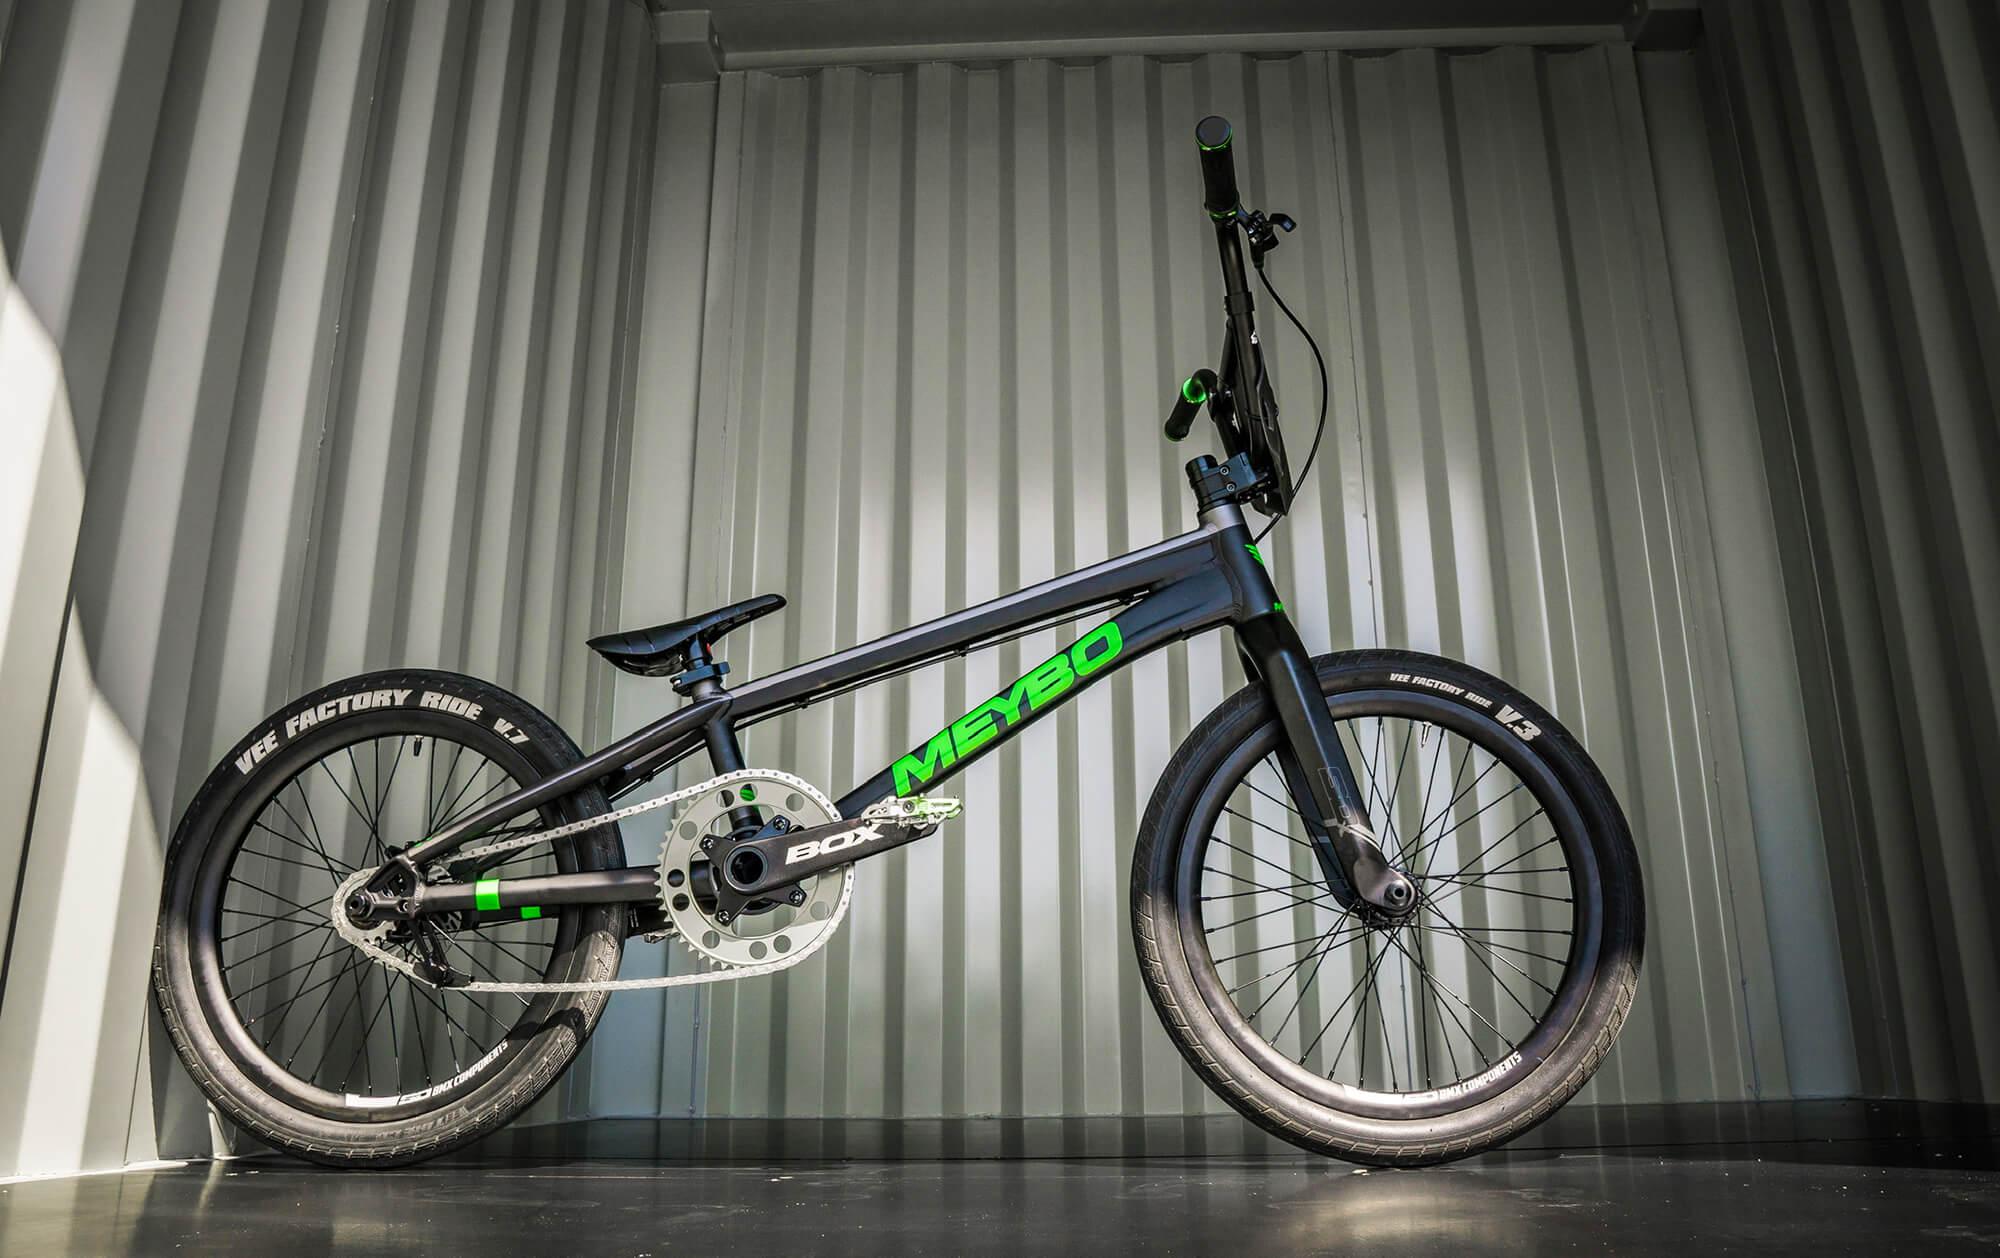 Team Oegema TVE Bike Check 2020 - DSC02140 - Niel Bensink